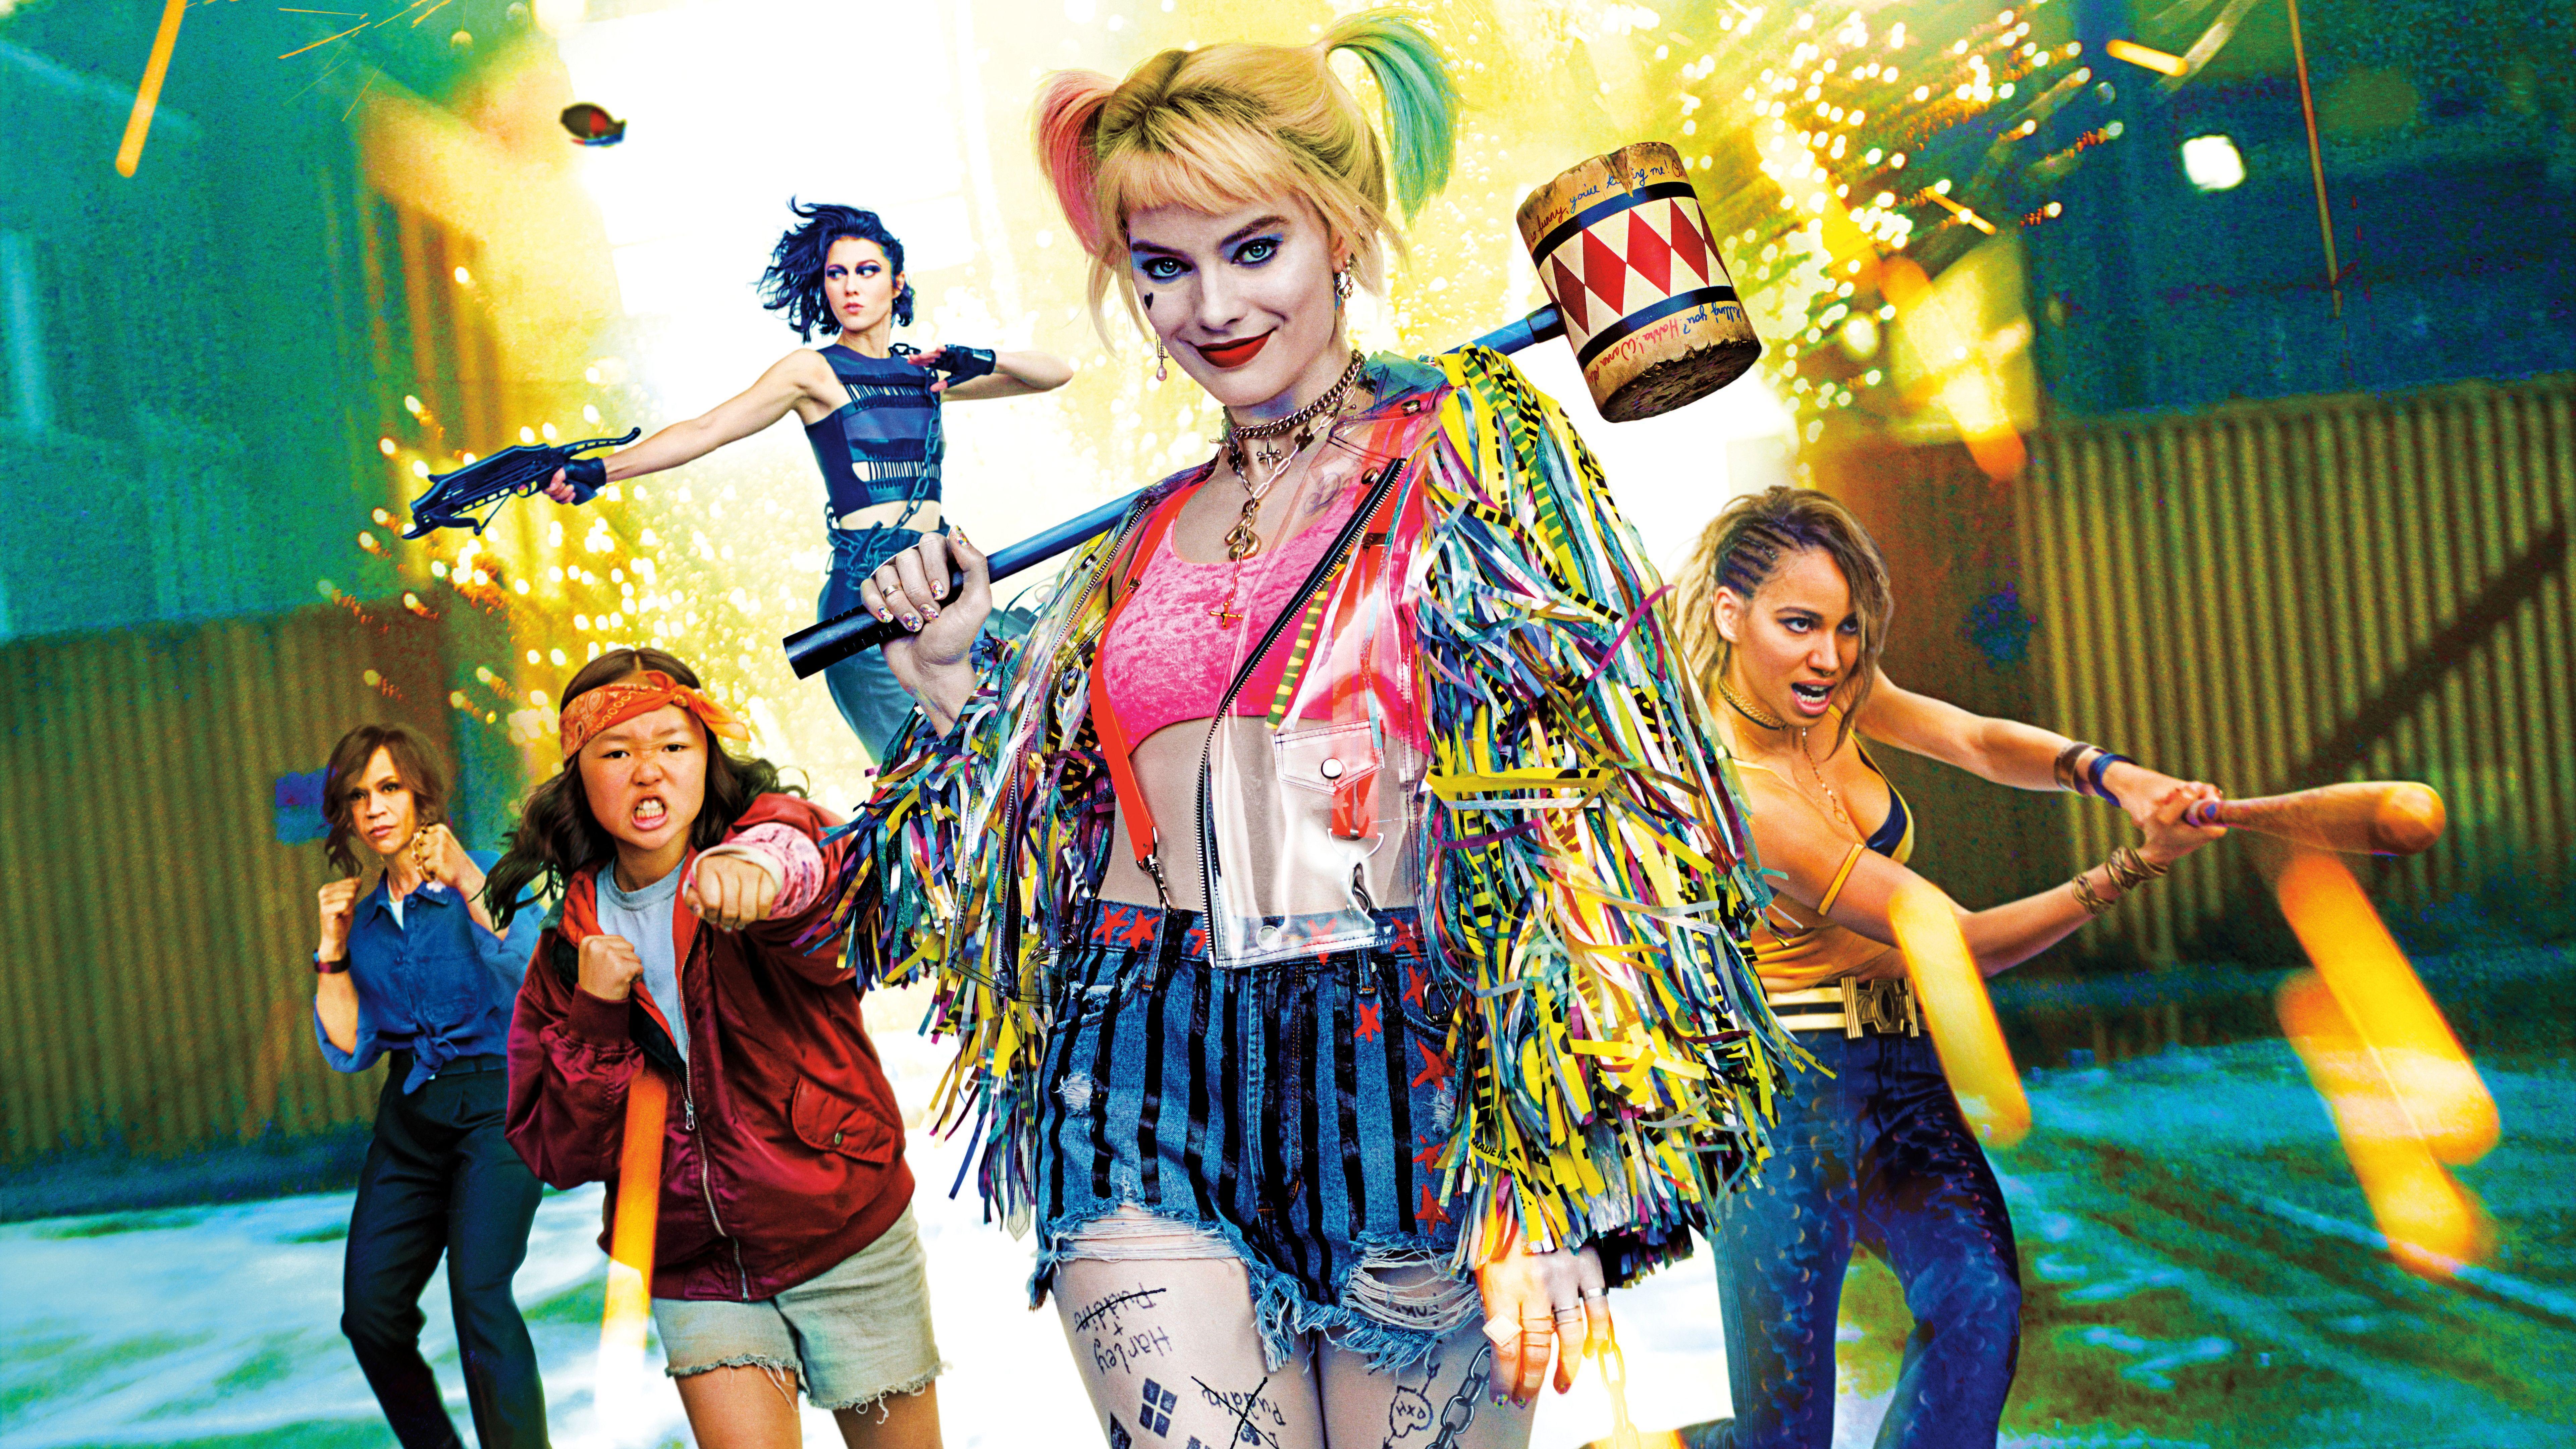 Margot Robbie In Birds Of Prey Wallpapers Top Free Margot Robbie